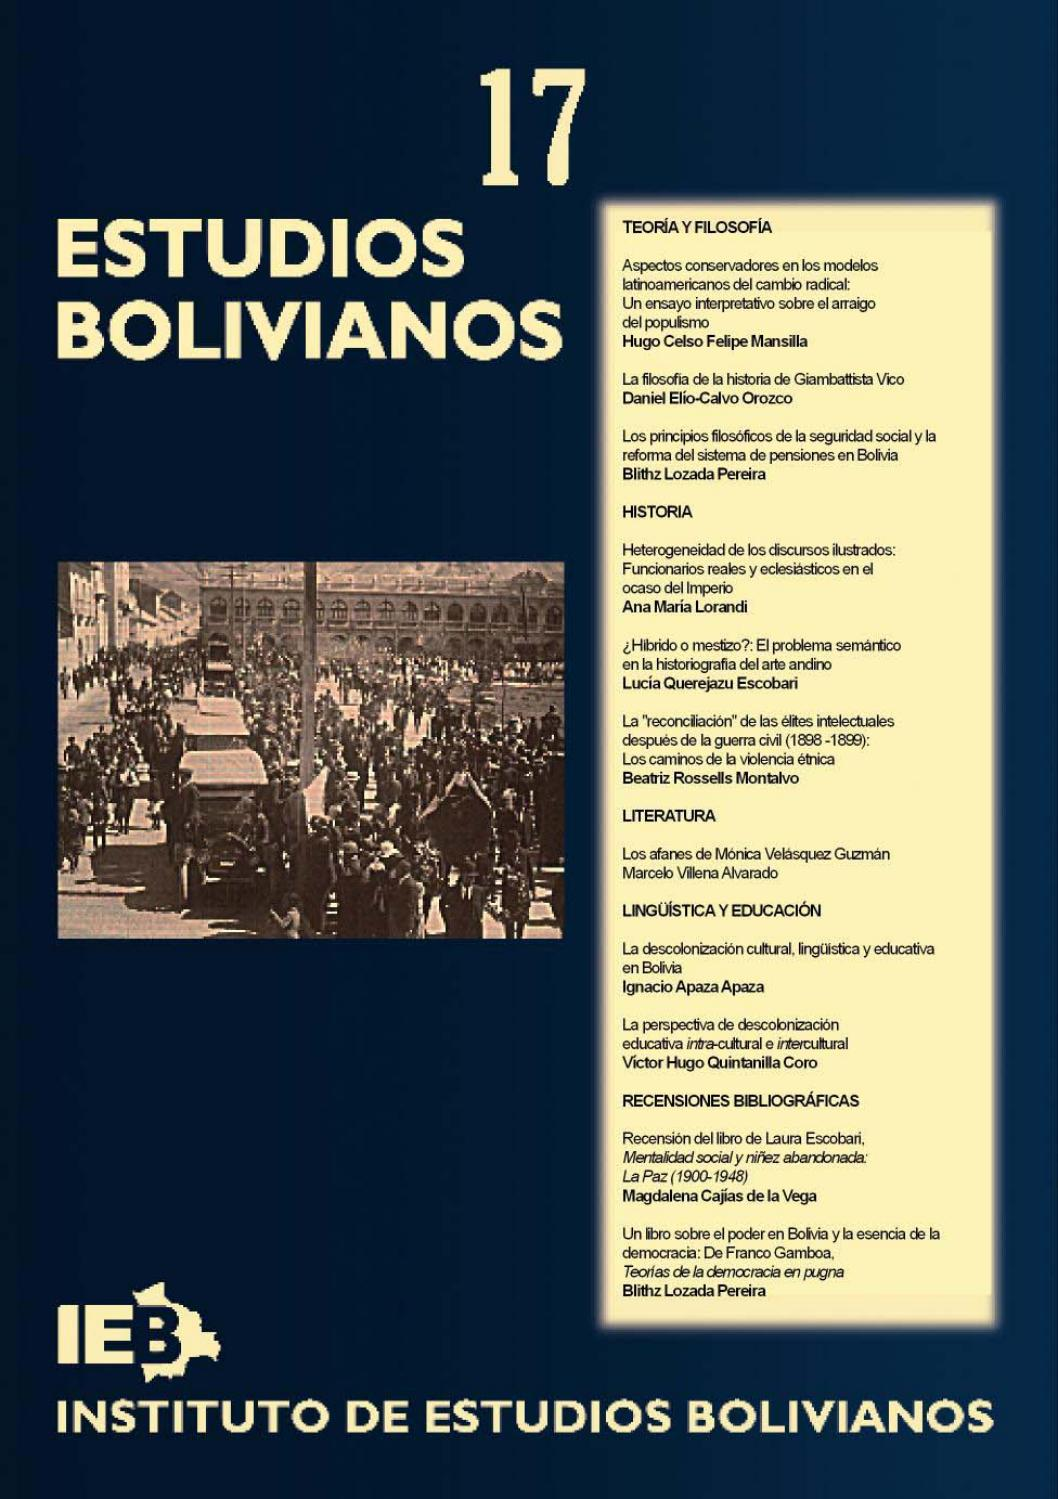 Estudios Bolivianos 017 by Postgrado Humanidades UMSA - issuu